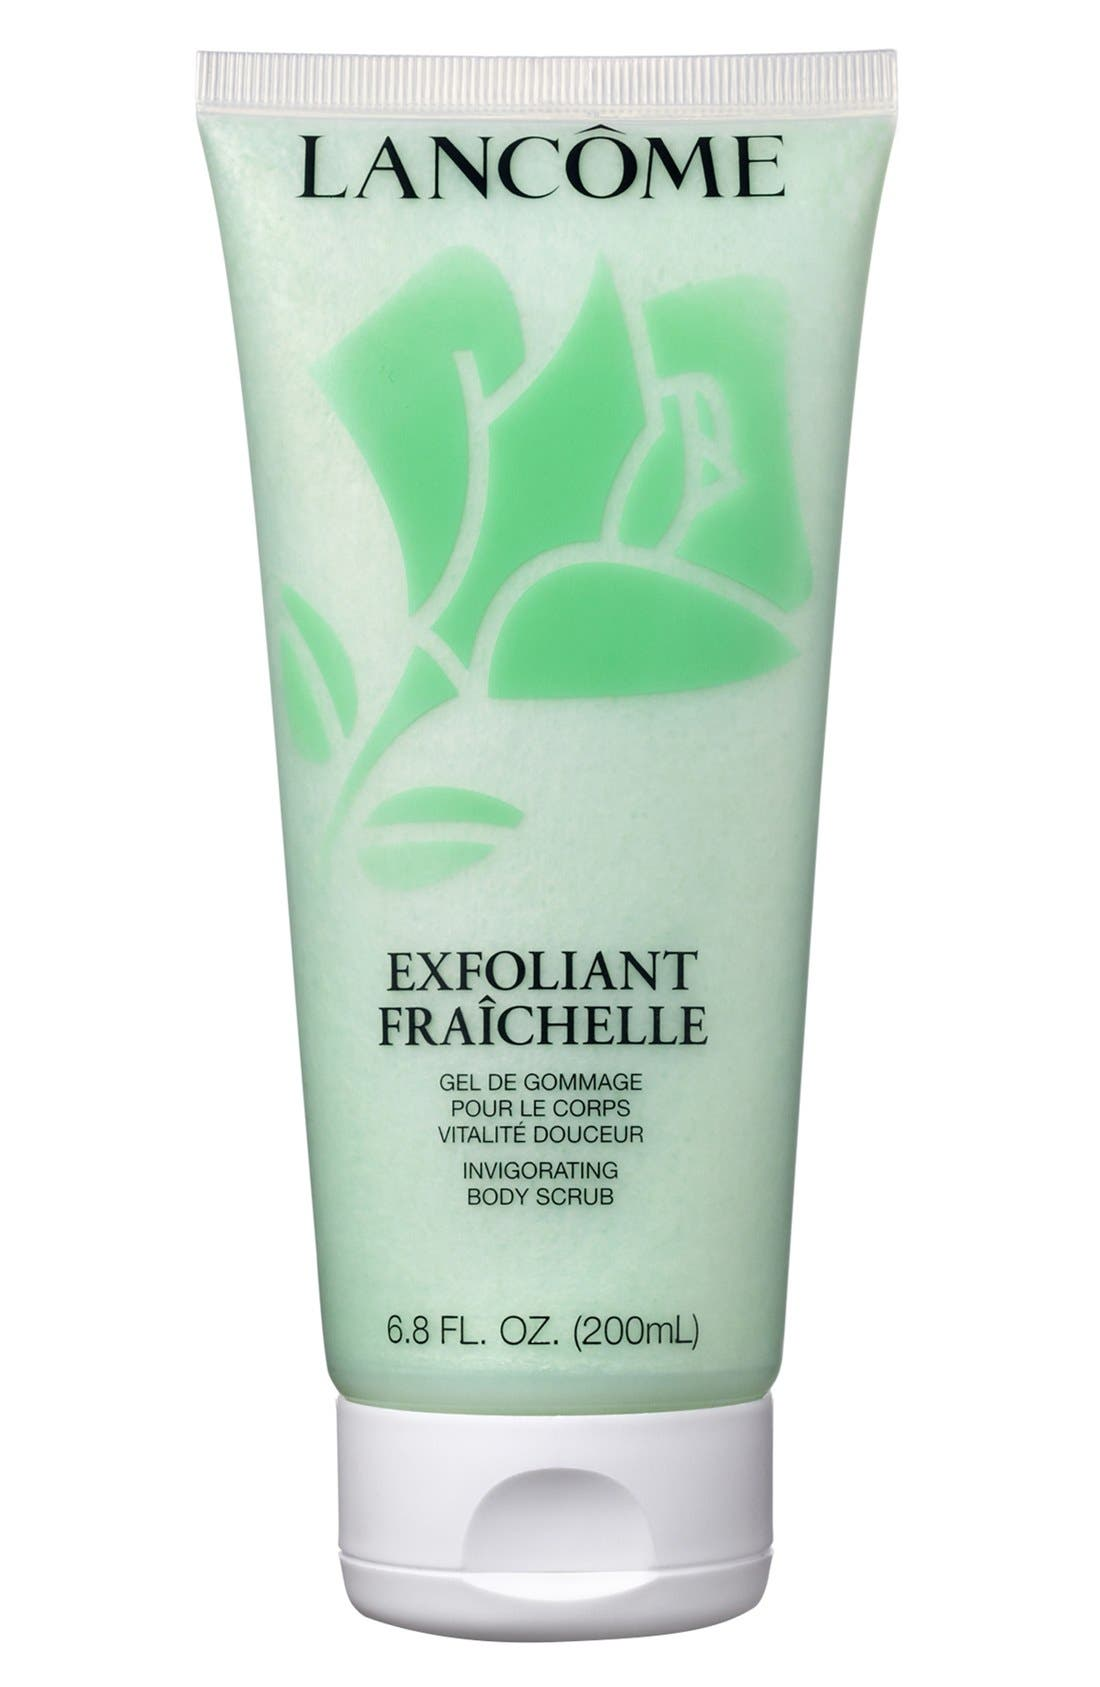 LANCÔME,                             'Exfoliant Fraîchelle' Invigorating Body Scrub,                             Main thumbnail 1, color,                             000